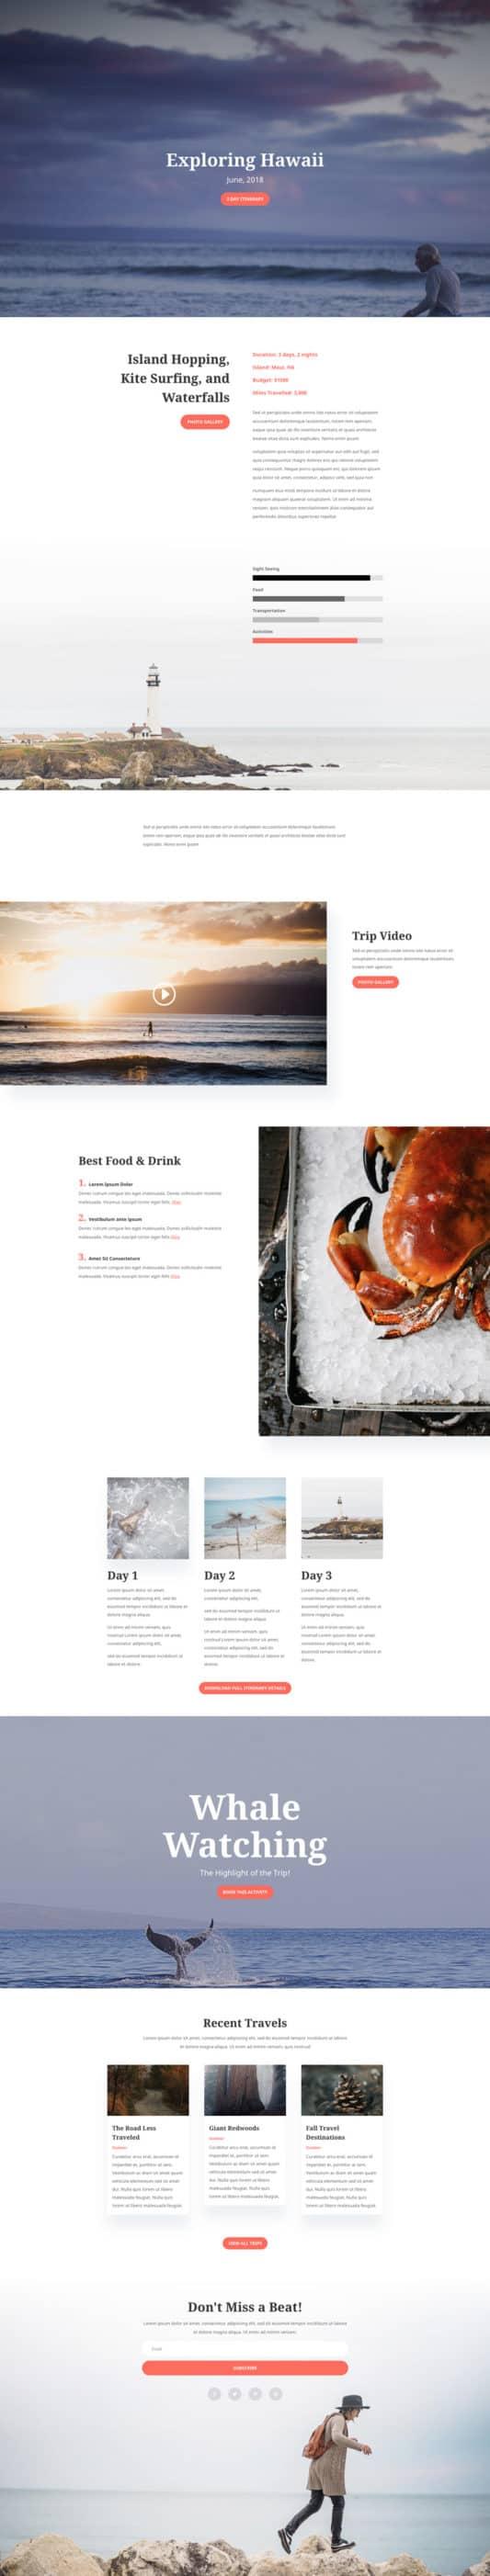 Travel Blog Web Design 6